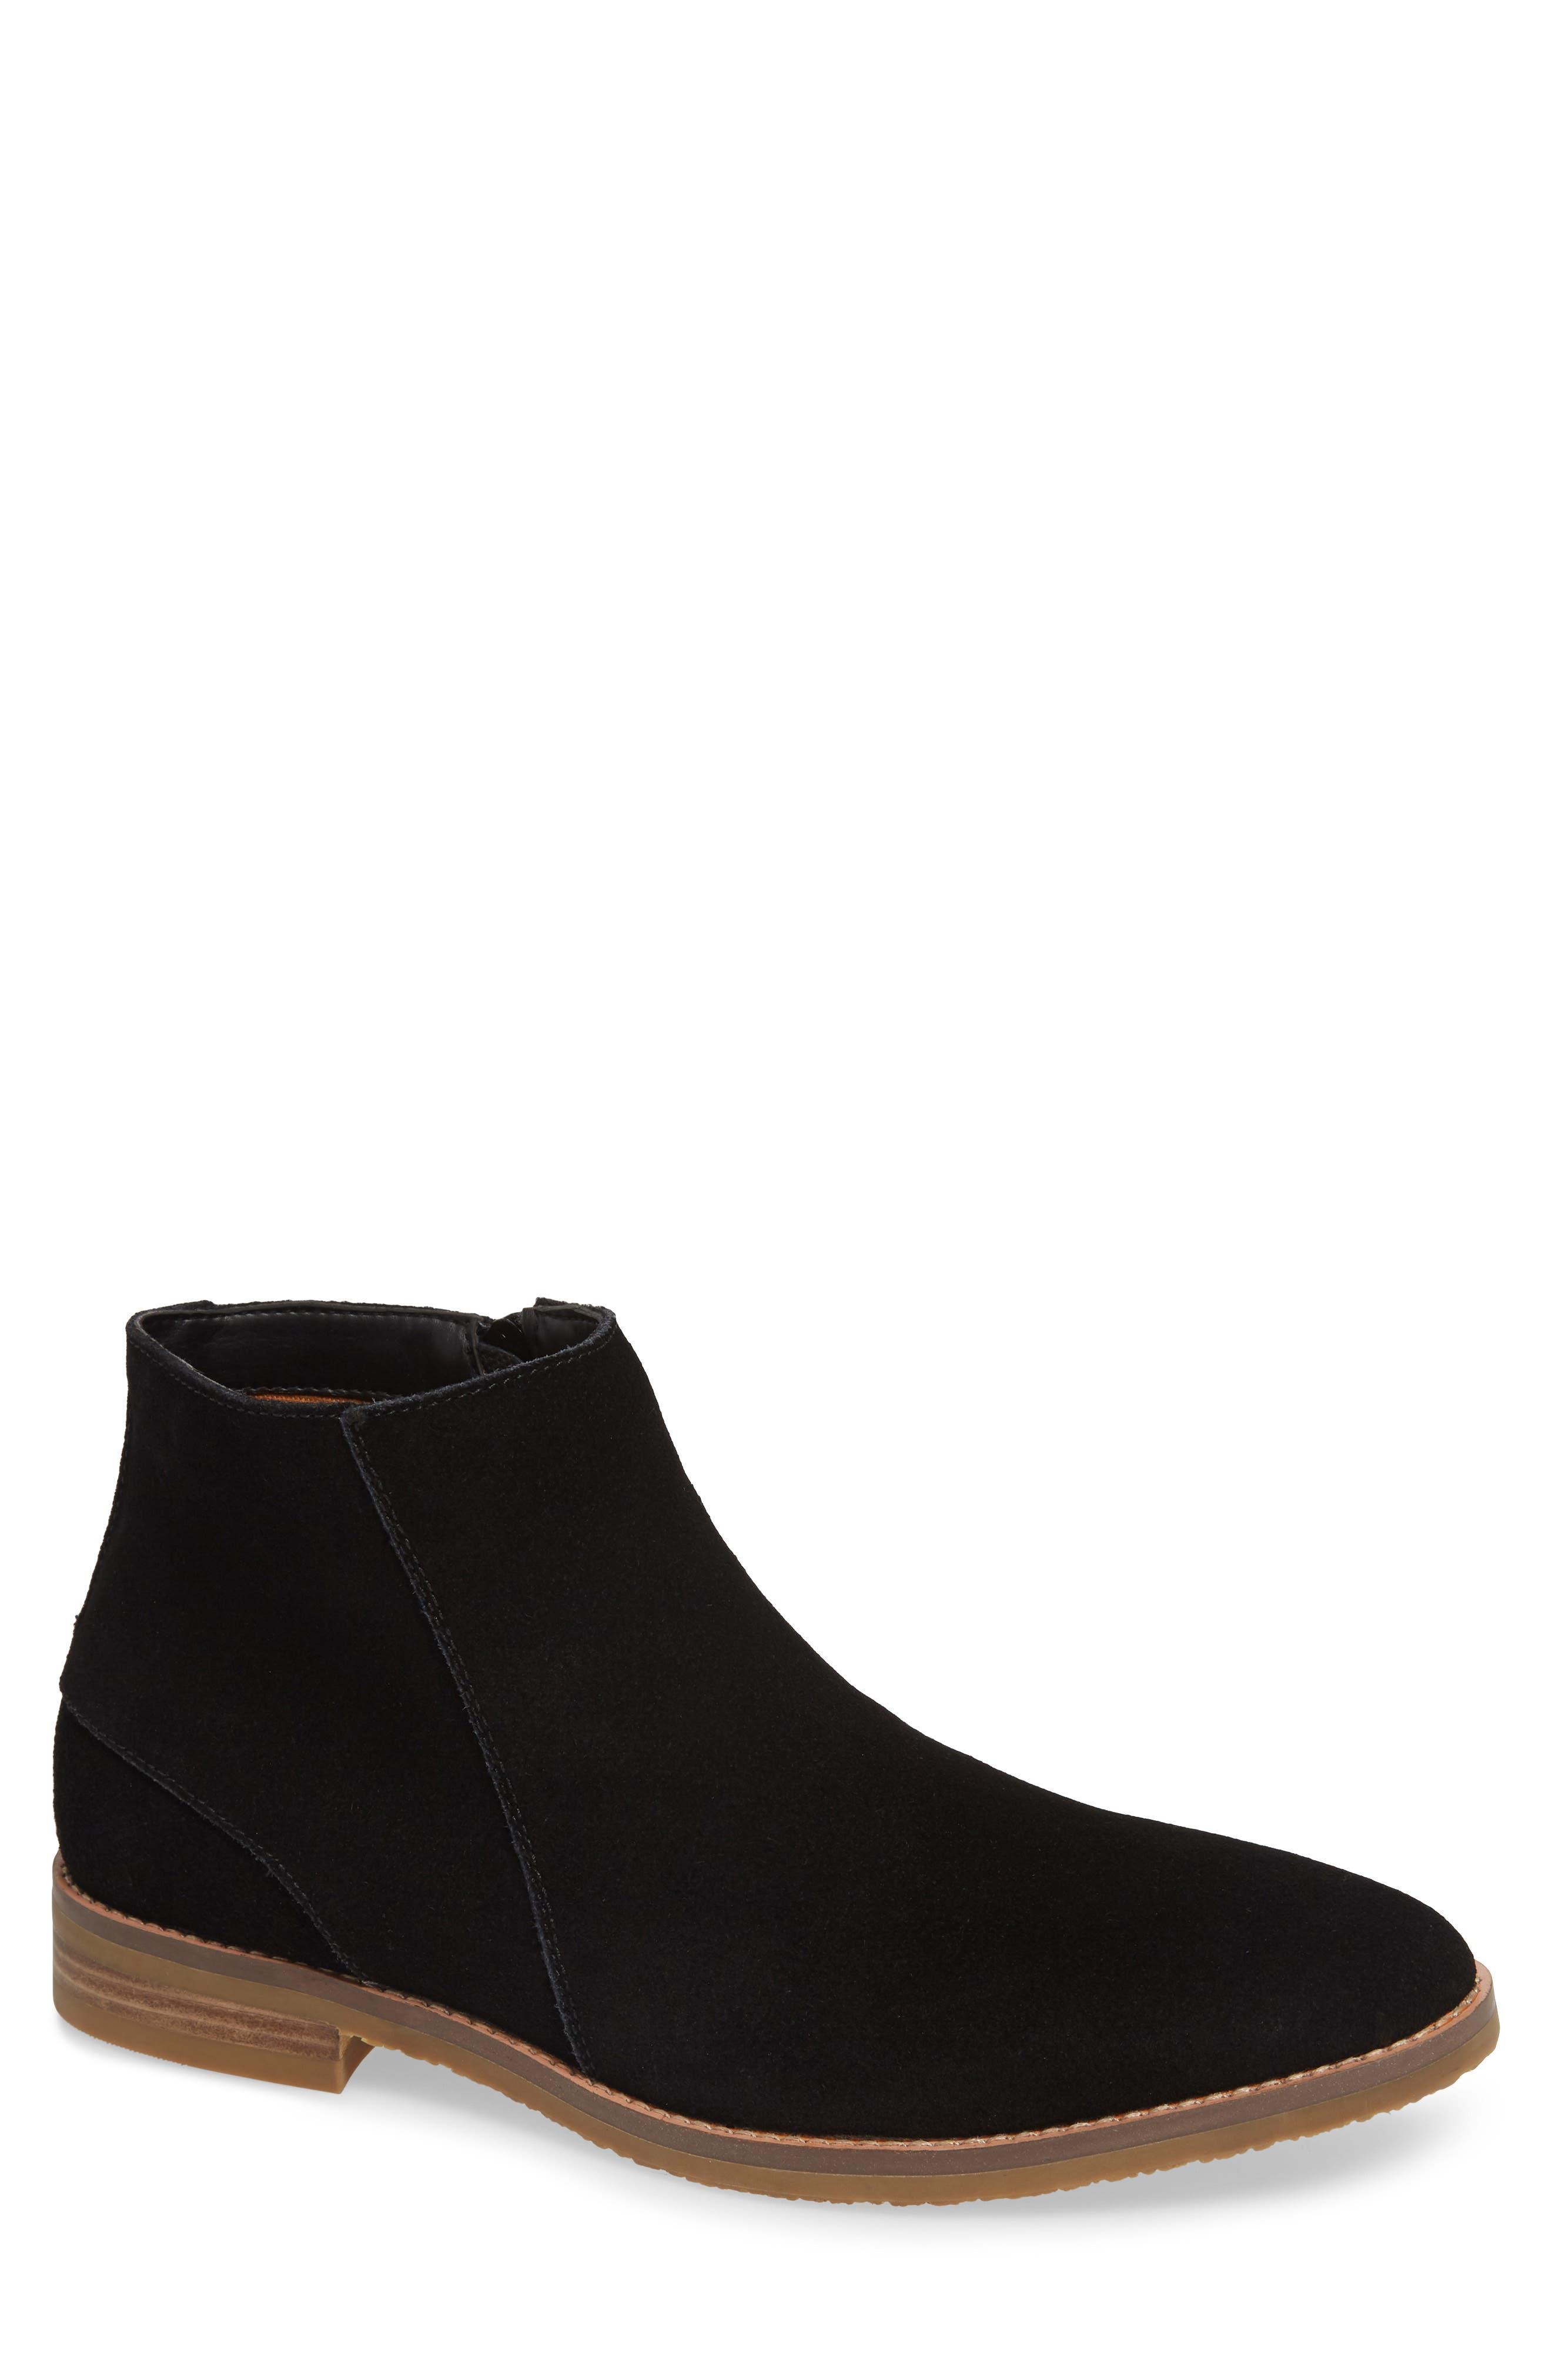 Jump Brighton Chelsea Zip Boot, Black